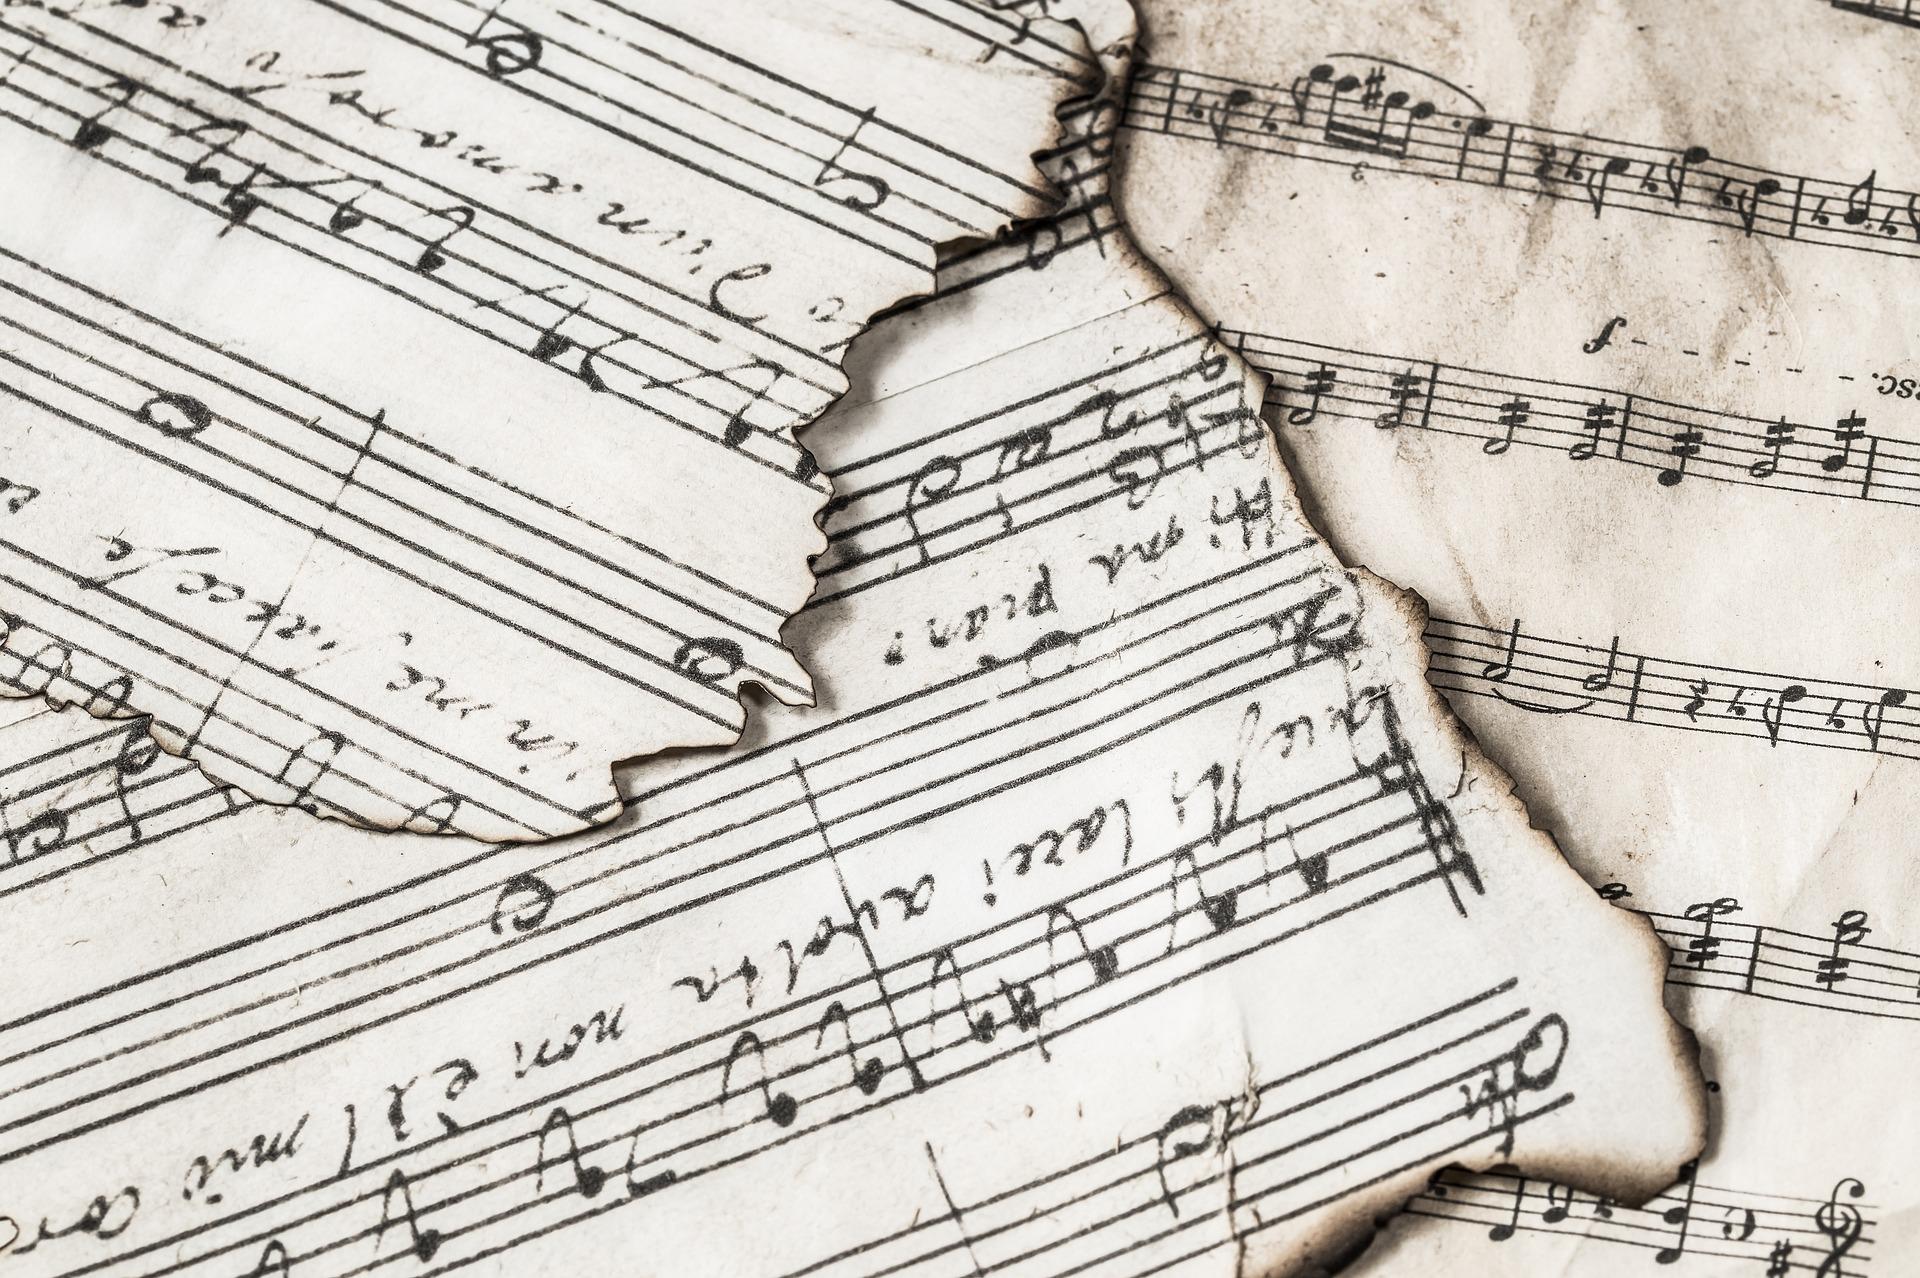 music-notes-3221097_1920.jpg